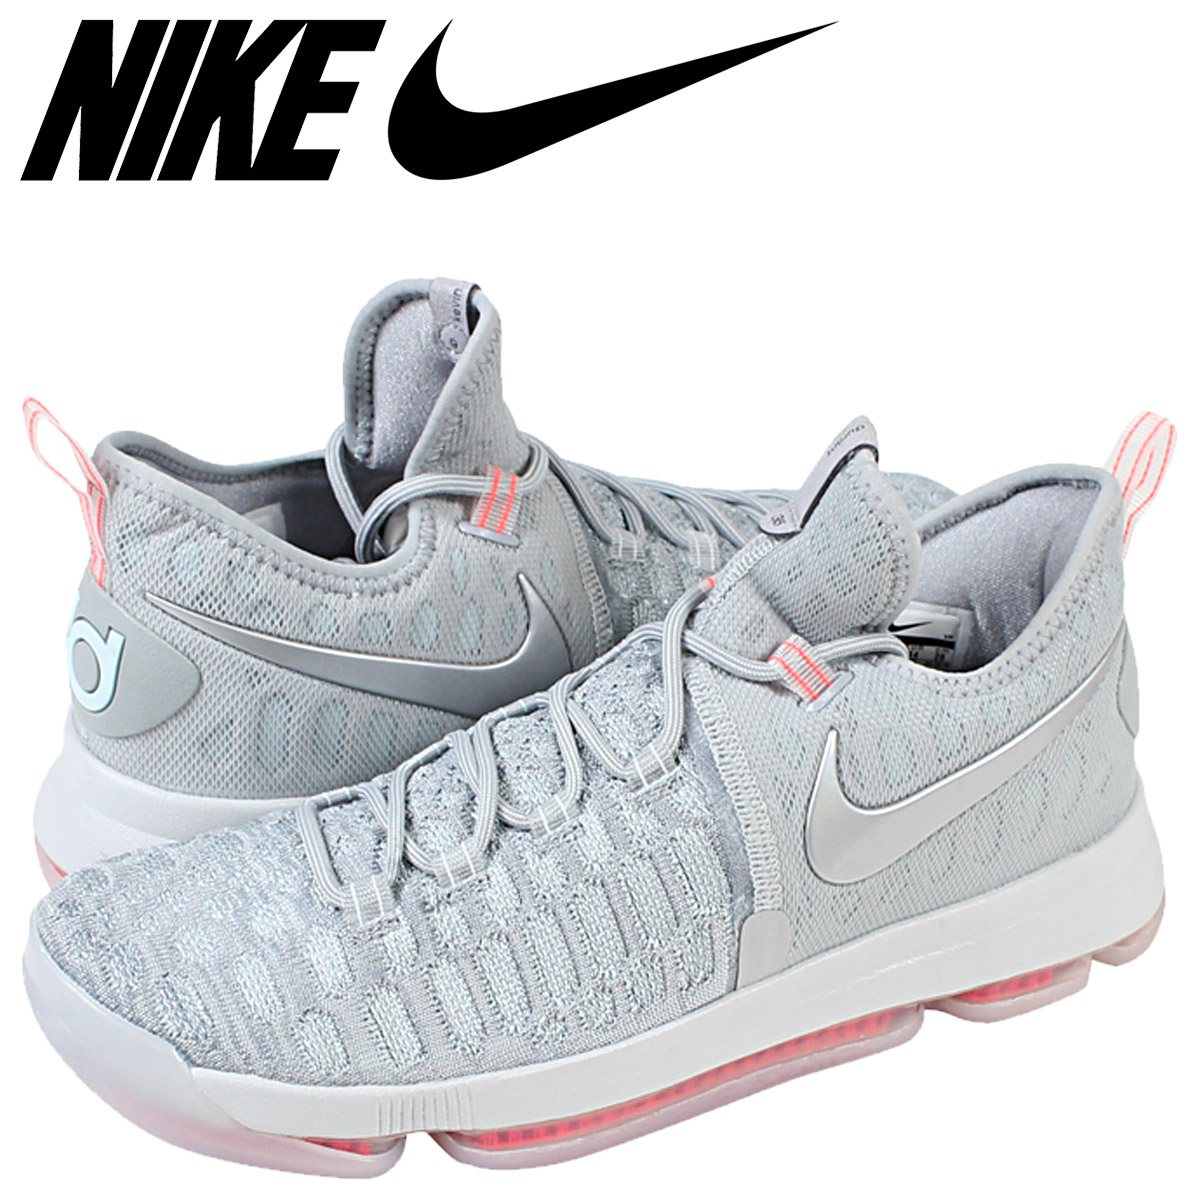 c5954c5a090f ALLSPORTS  NIKE Nike zoom sneakers ZOOM KD9 LMTD PRE-HEAT Kevin ...